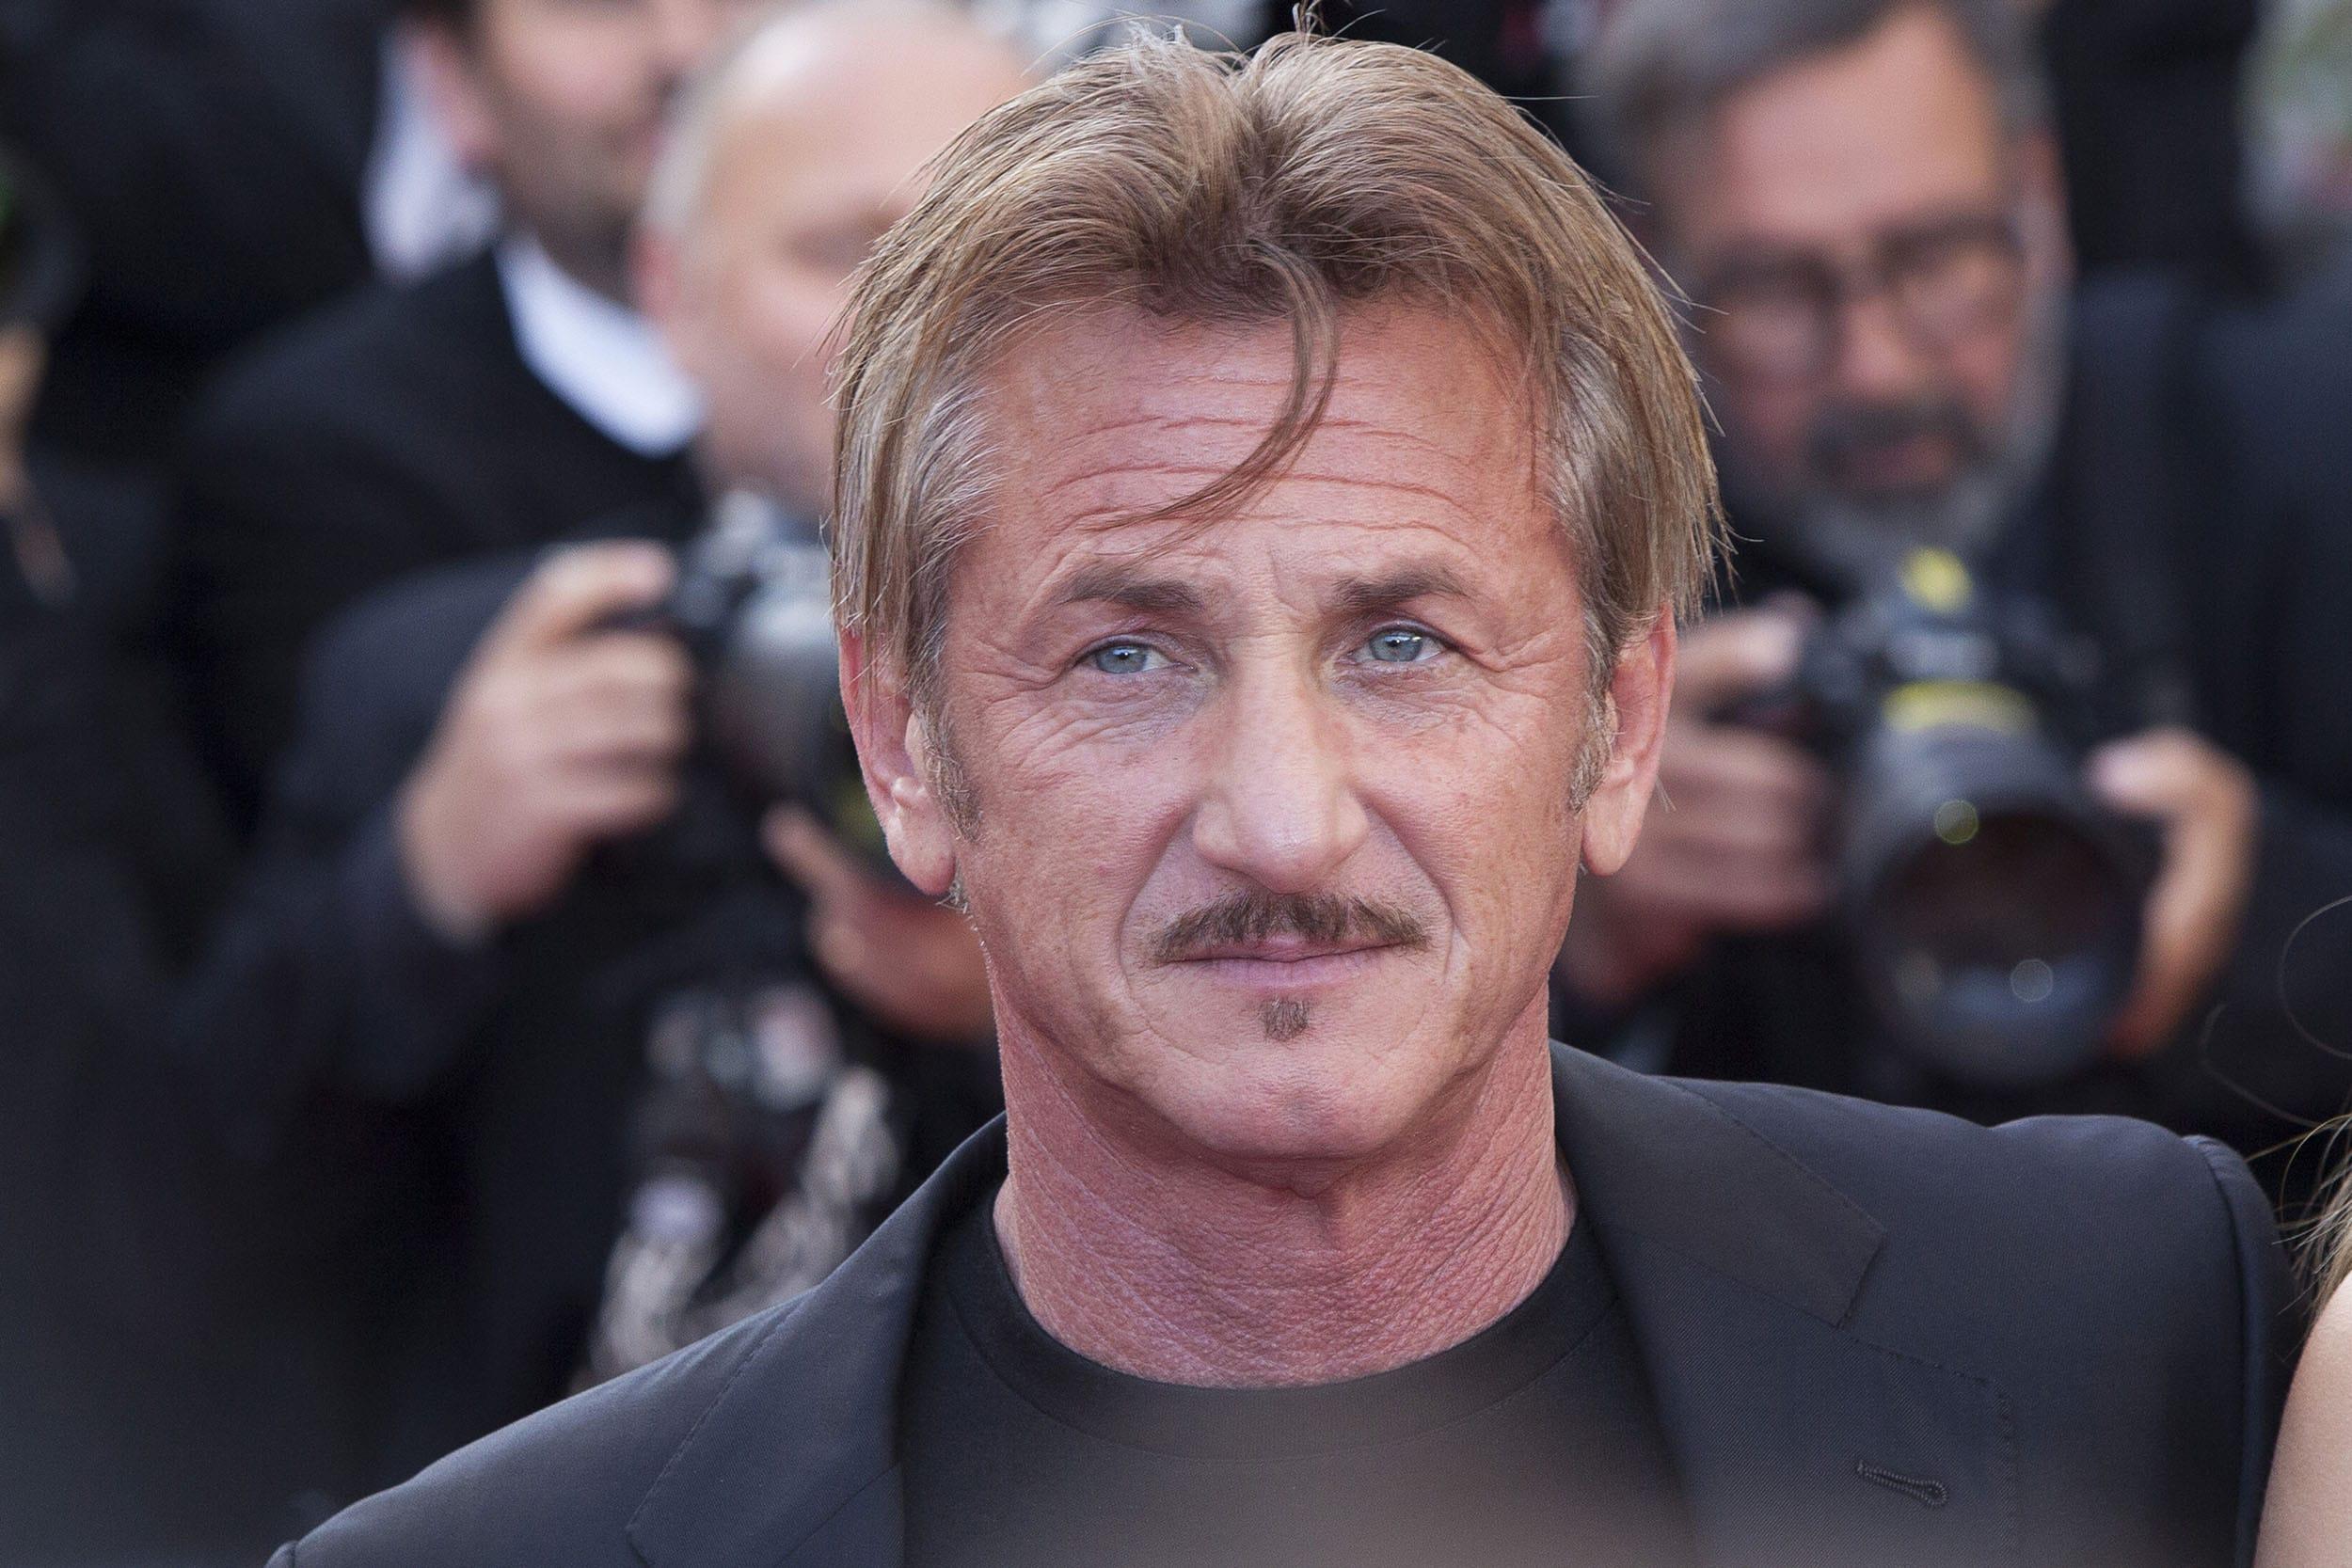 Sohn von Oscar-Preisträger Sean Penn festgenommen